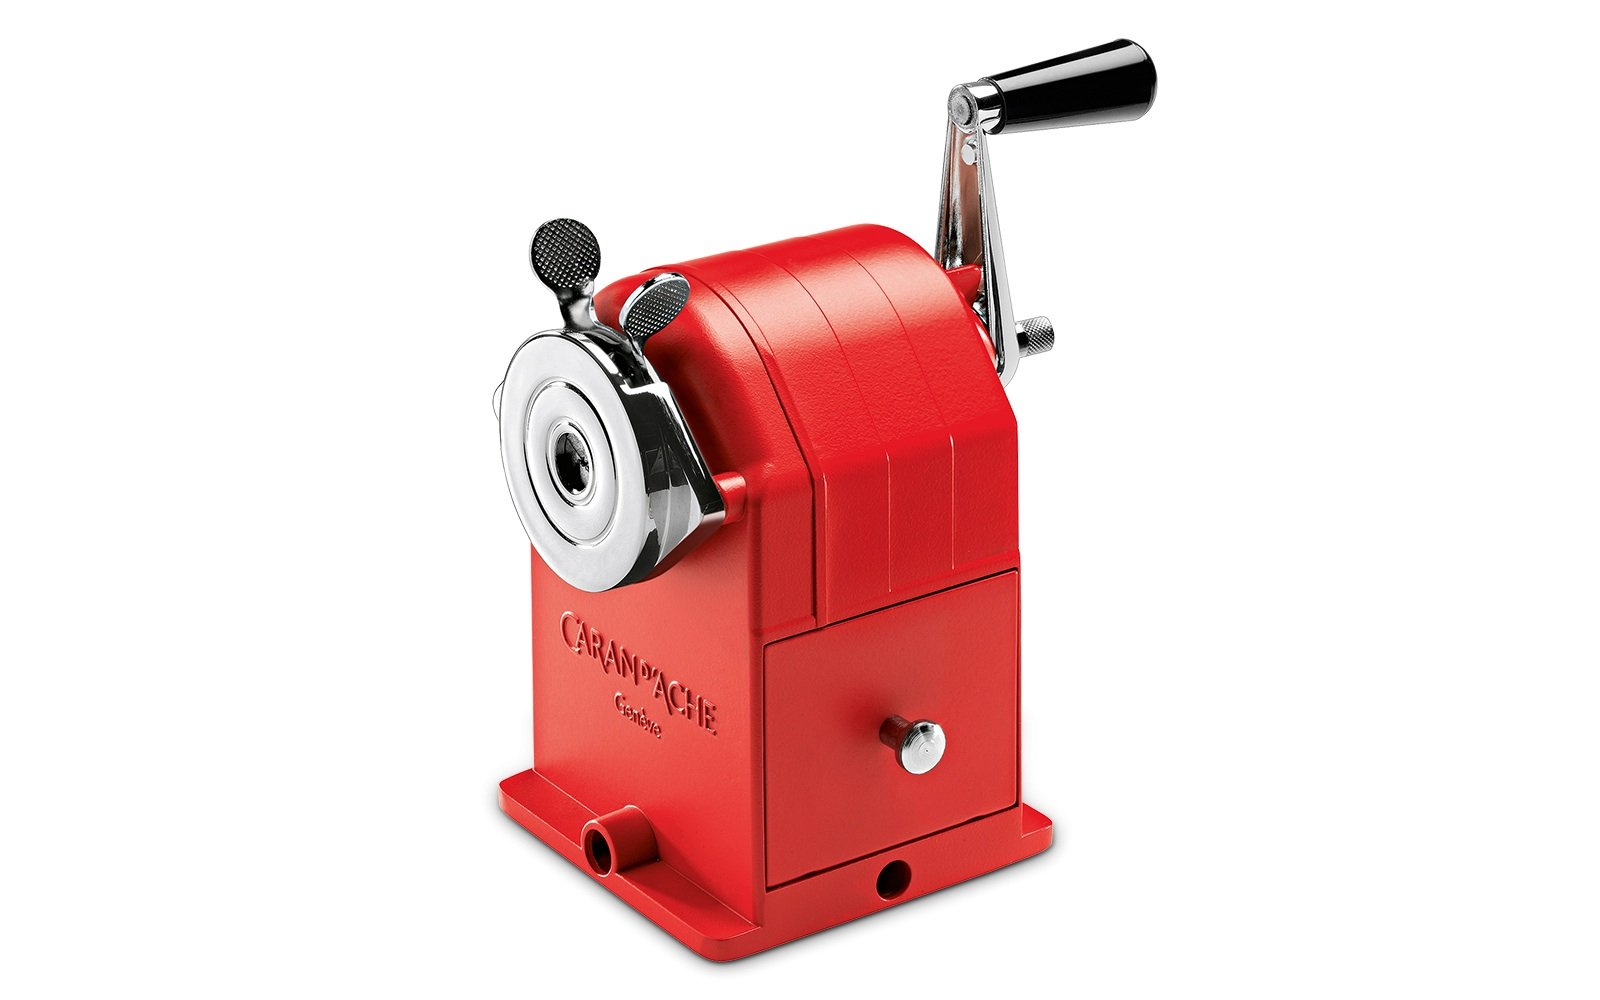 Caran D'ache Pencil-Sharpening Machine Red by Caran d'Ache